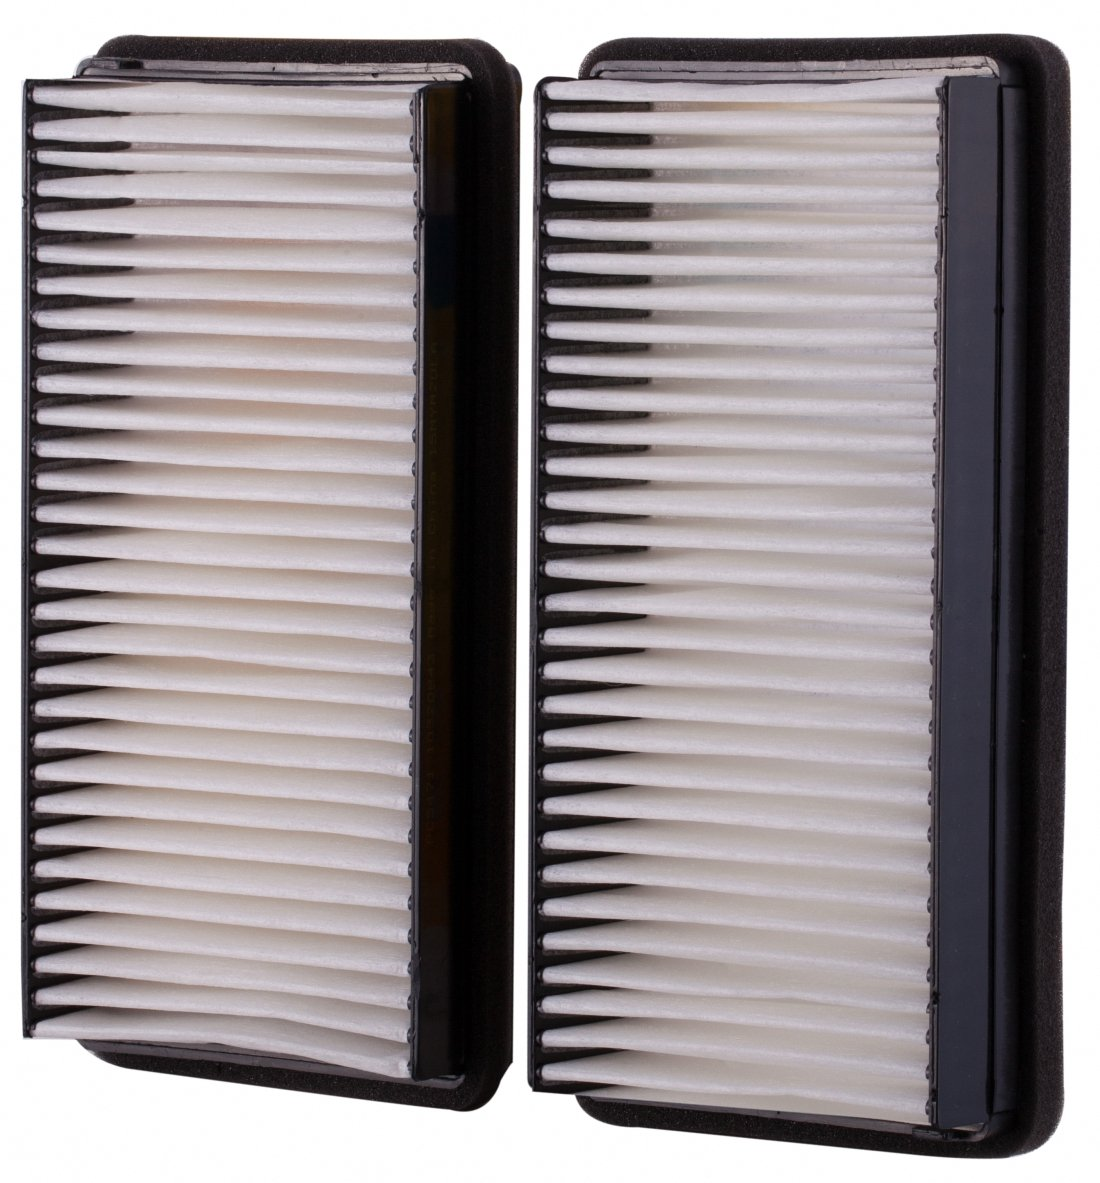 Premium Guard PC5471 Cabin Air Filter